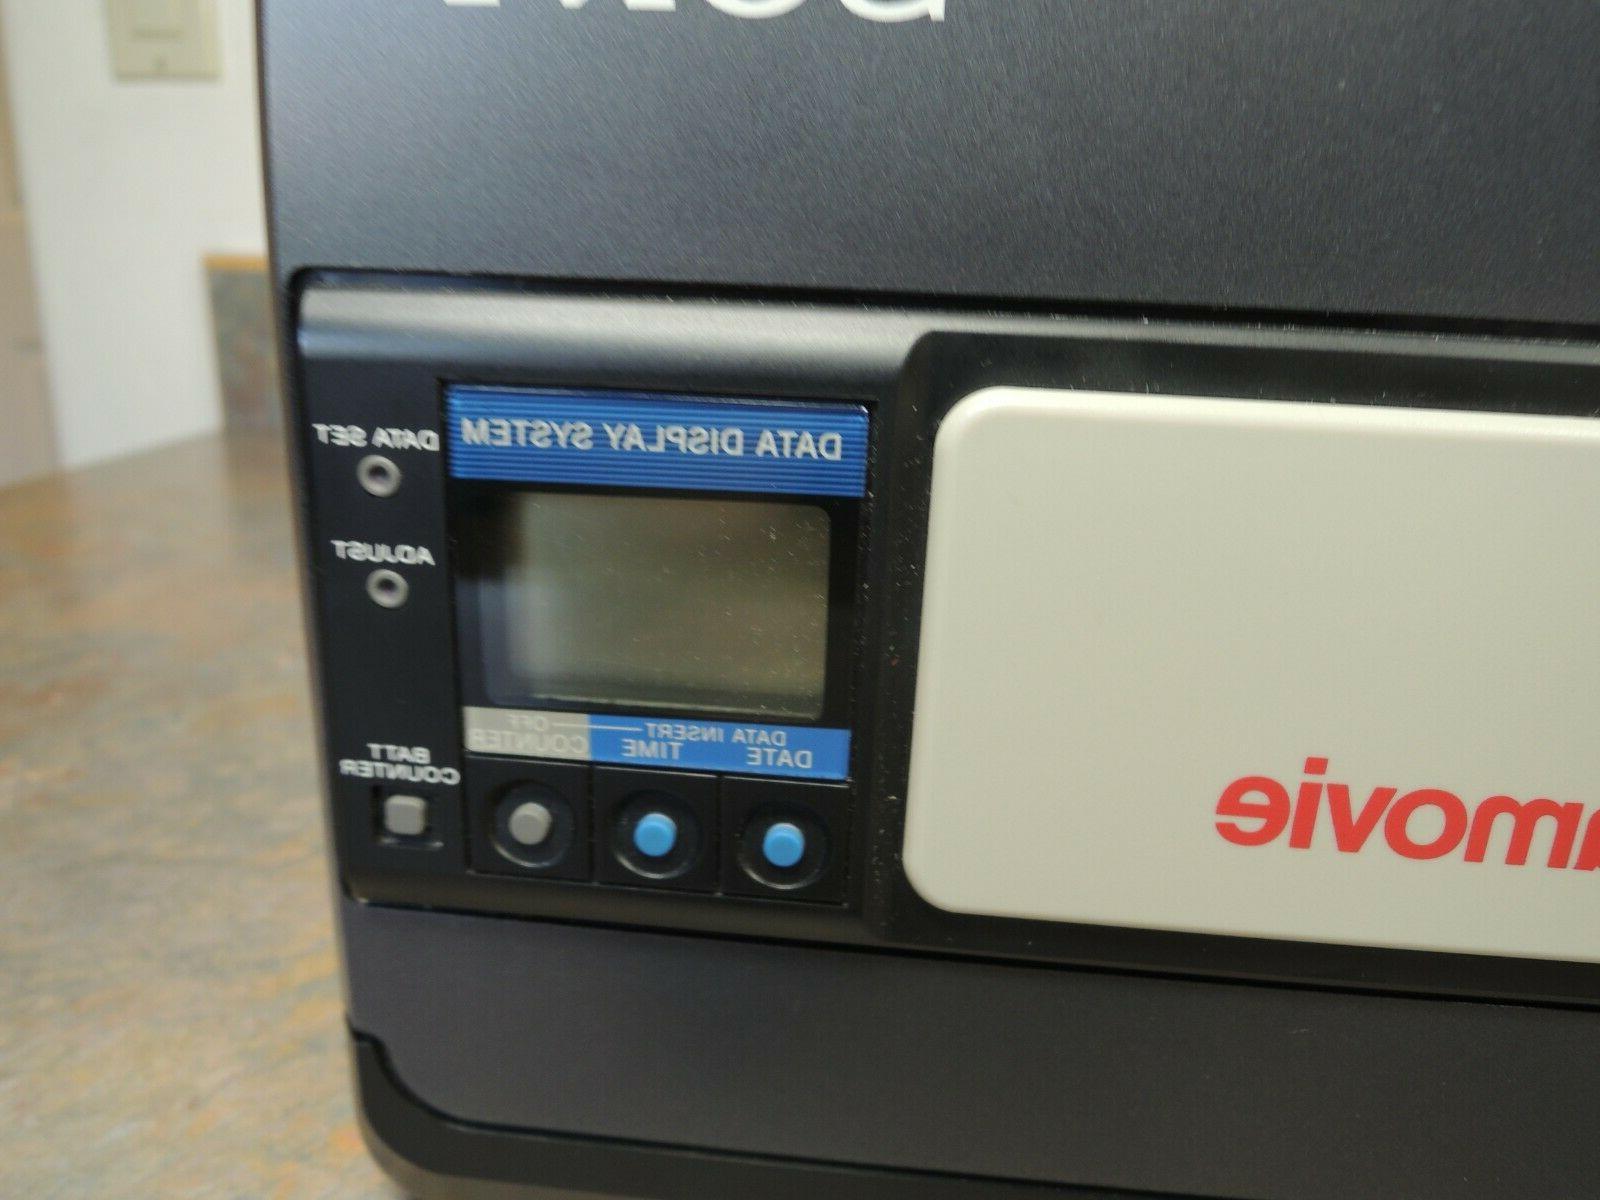 SONY Camcorder Video Camera VTG BMC 550 WORKS